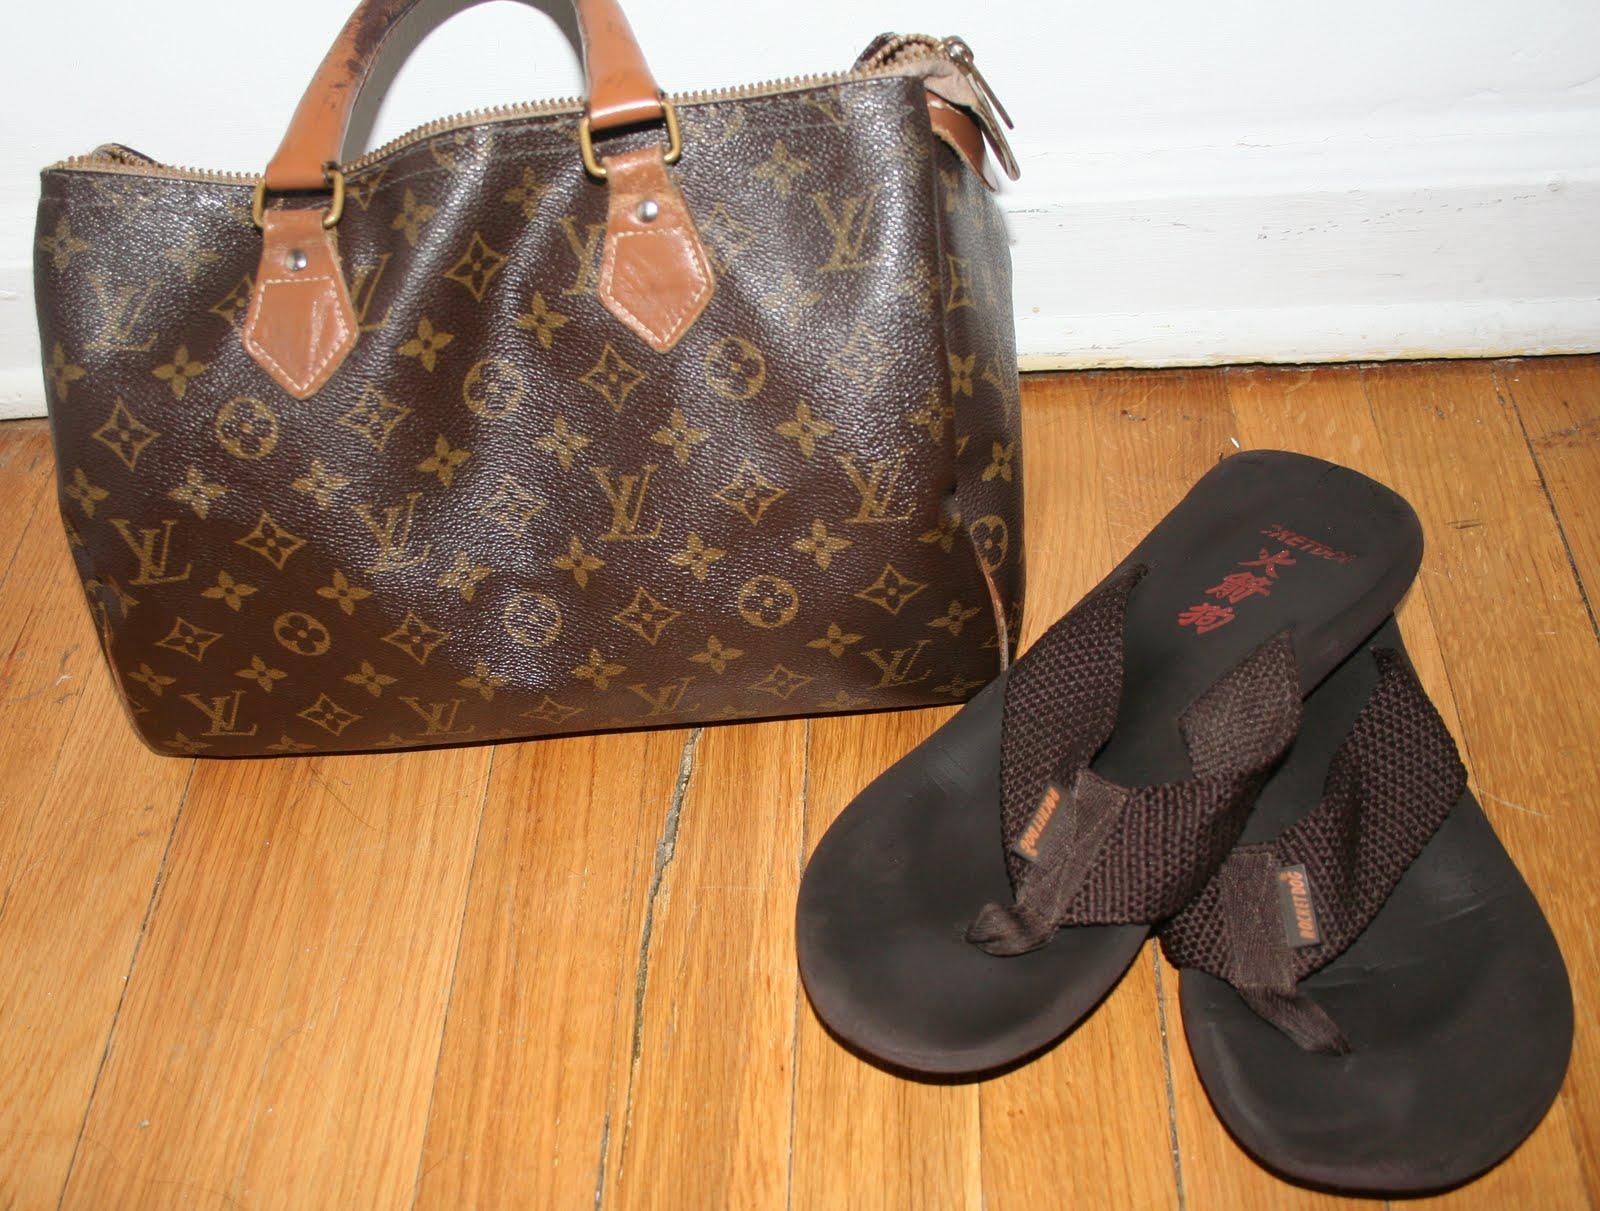 Image Result For Louis Vuitton Flip Flops